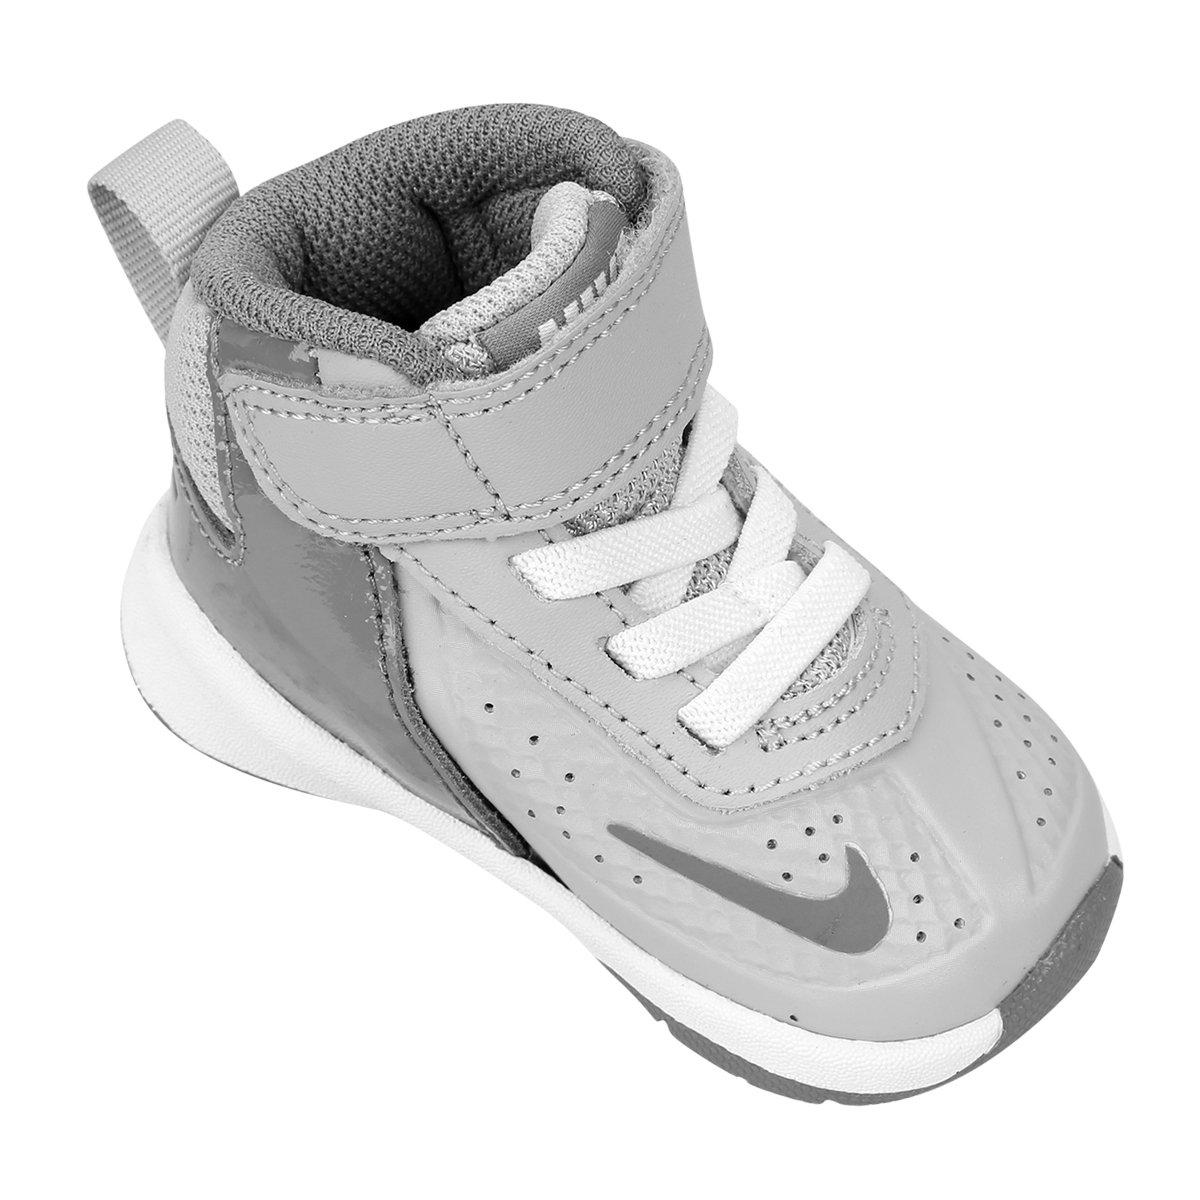 d67c2e1770 Tênis Nike Team Hustle D 7 Infantil - Compre Agora